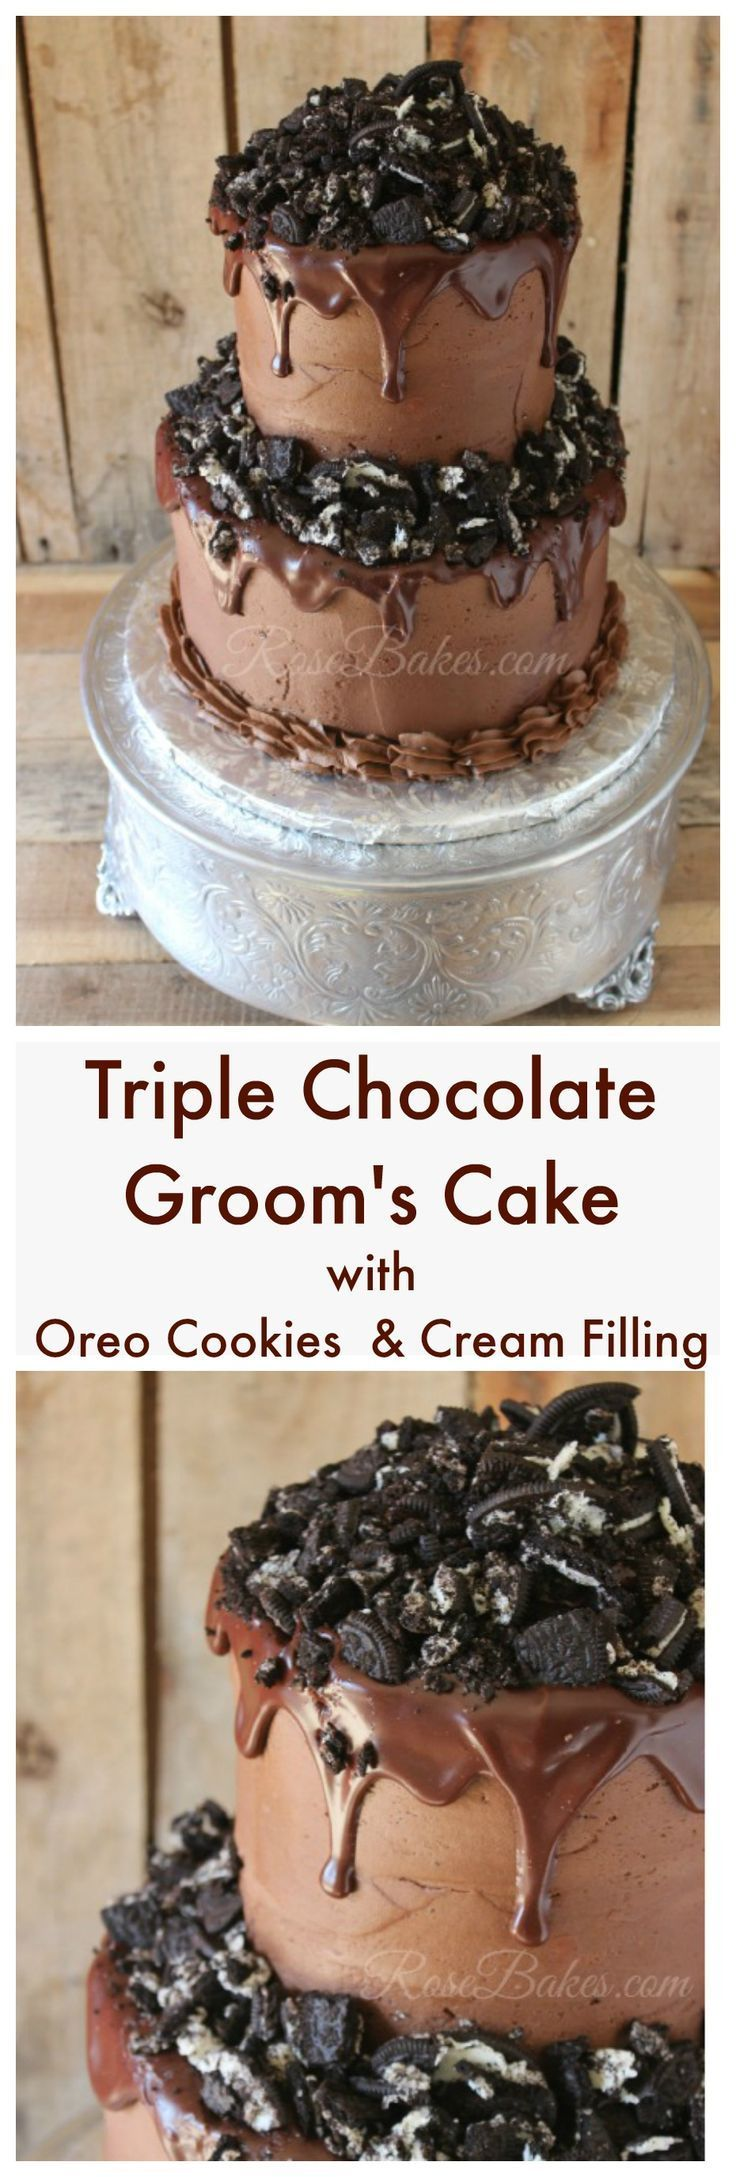 Triple Chocolate Groom's Cake with Oreo Cookies & Cream Filling